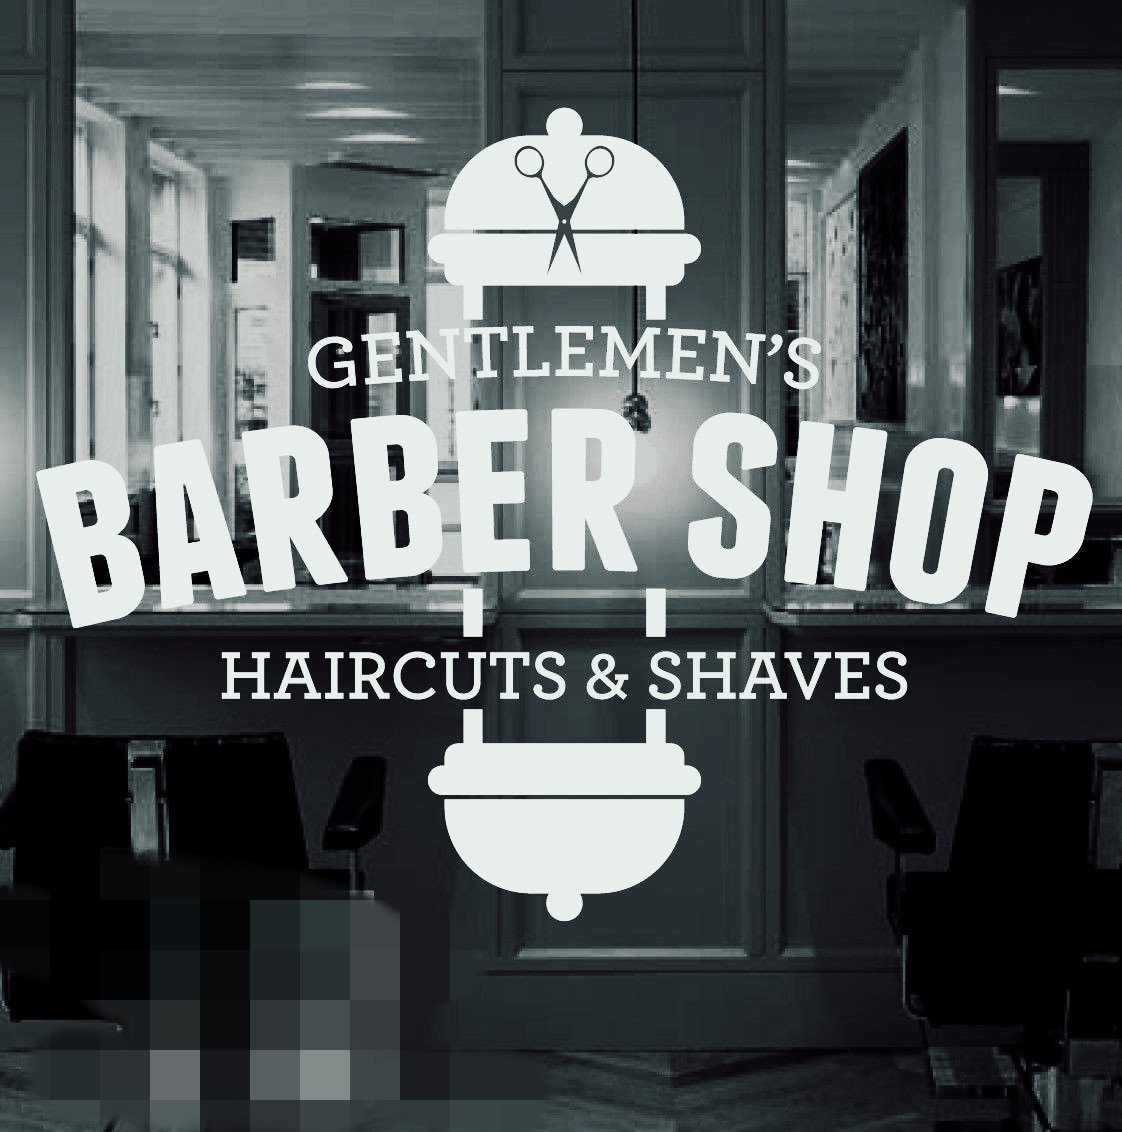 Amazon Barber Shop Vinyl Window Sticker Decal Hair Dressers